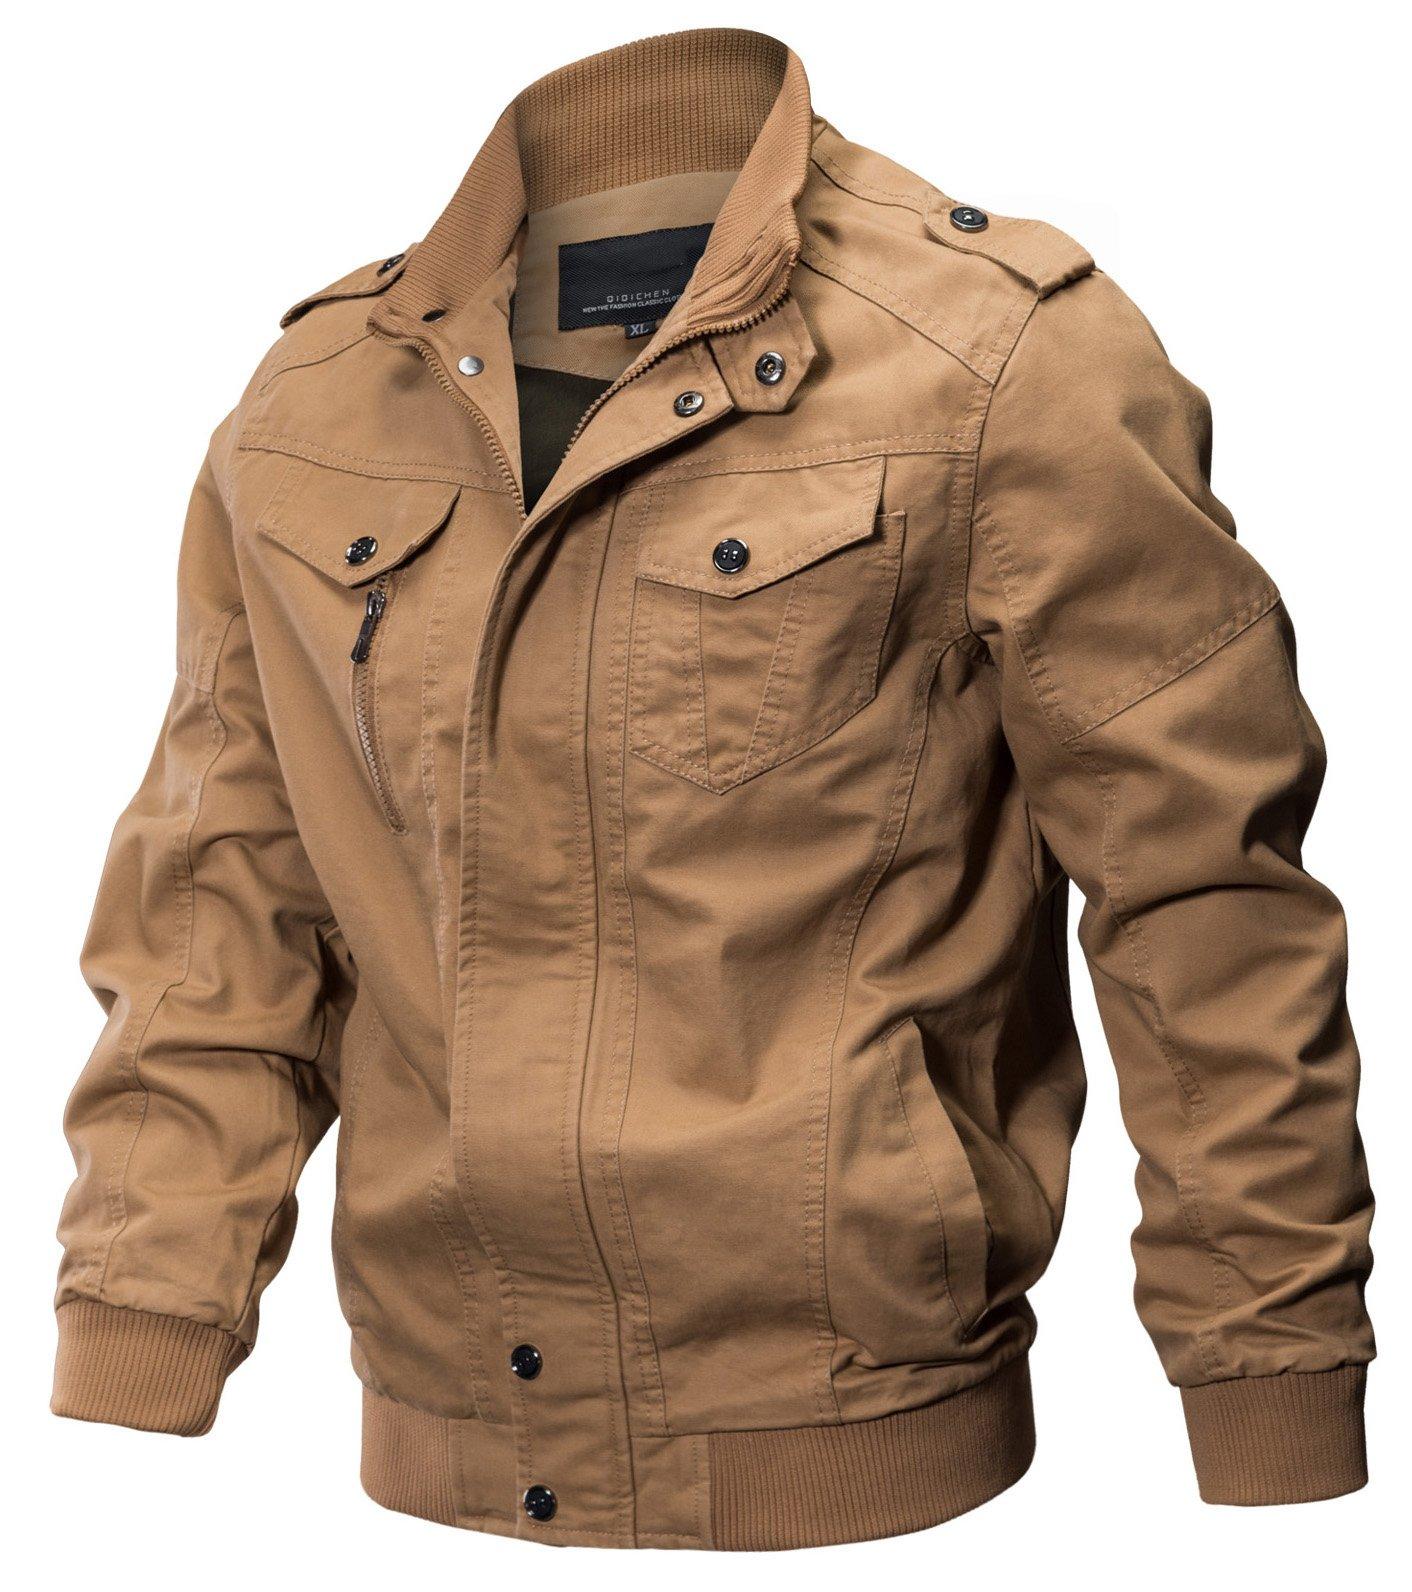 WULFUL Men's Cotton Military Jackets Casual Outdoor Coat Windbreaker Jacket Khaki S by WULFUL